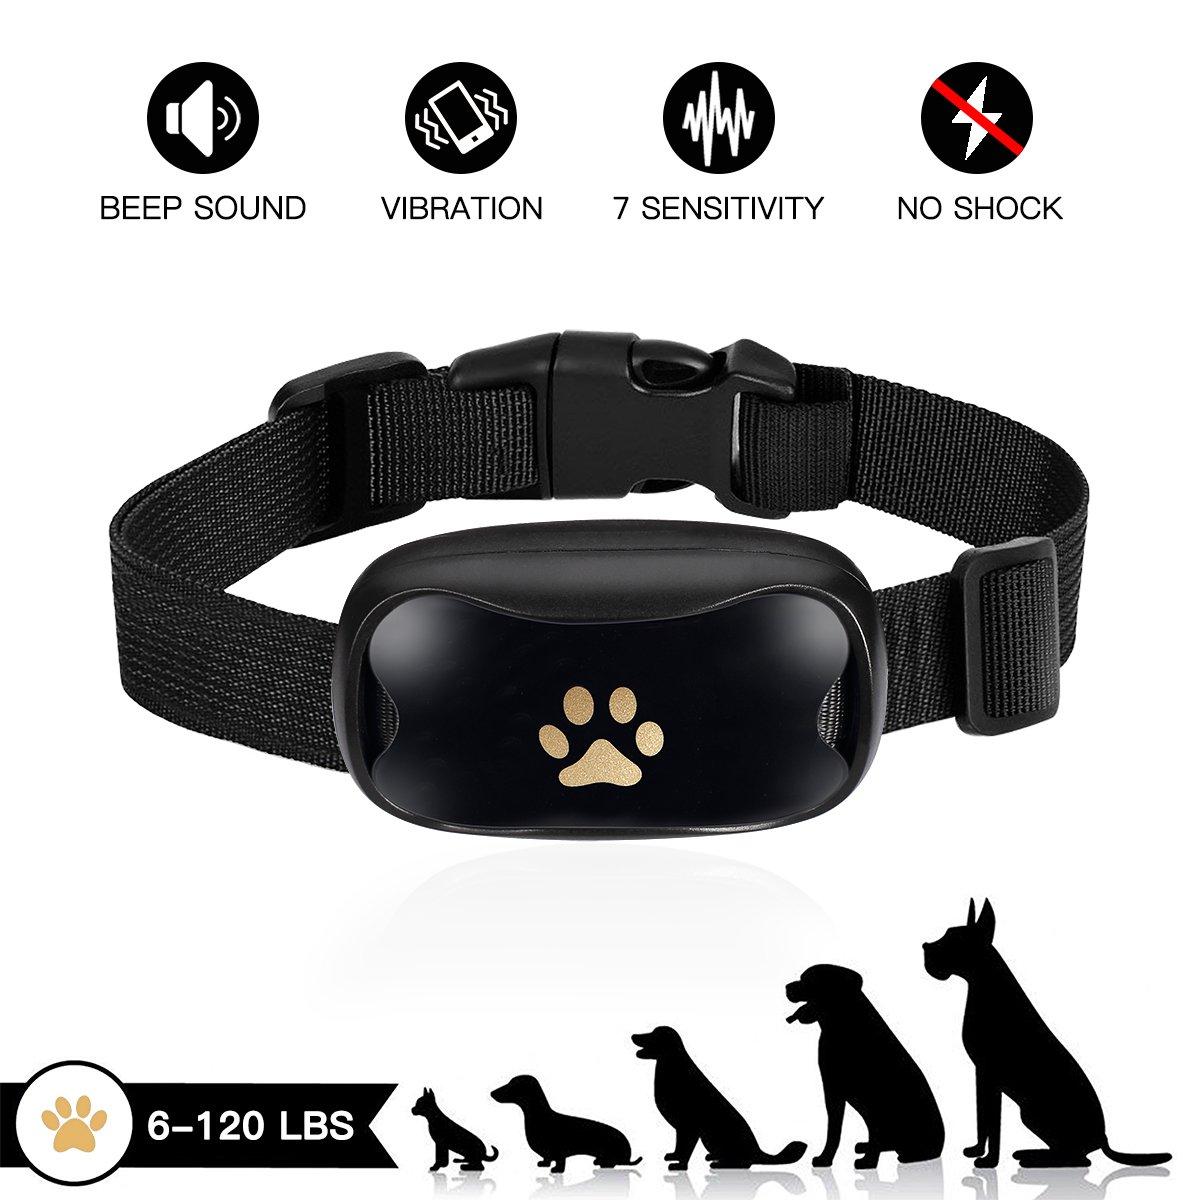 MANZOKU Bark Collar, No Shock Humane Bark Collar Sound Vibration 7 Sensitivity Waterproof Harmless Bark Control Collar Small Medium Large Dogs